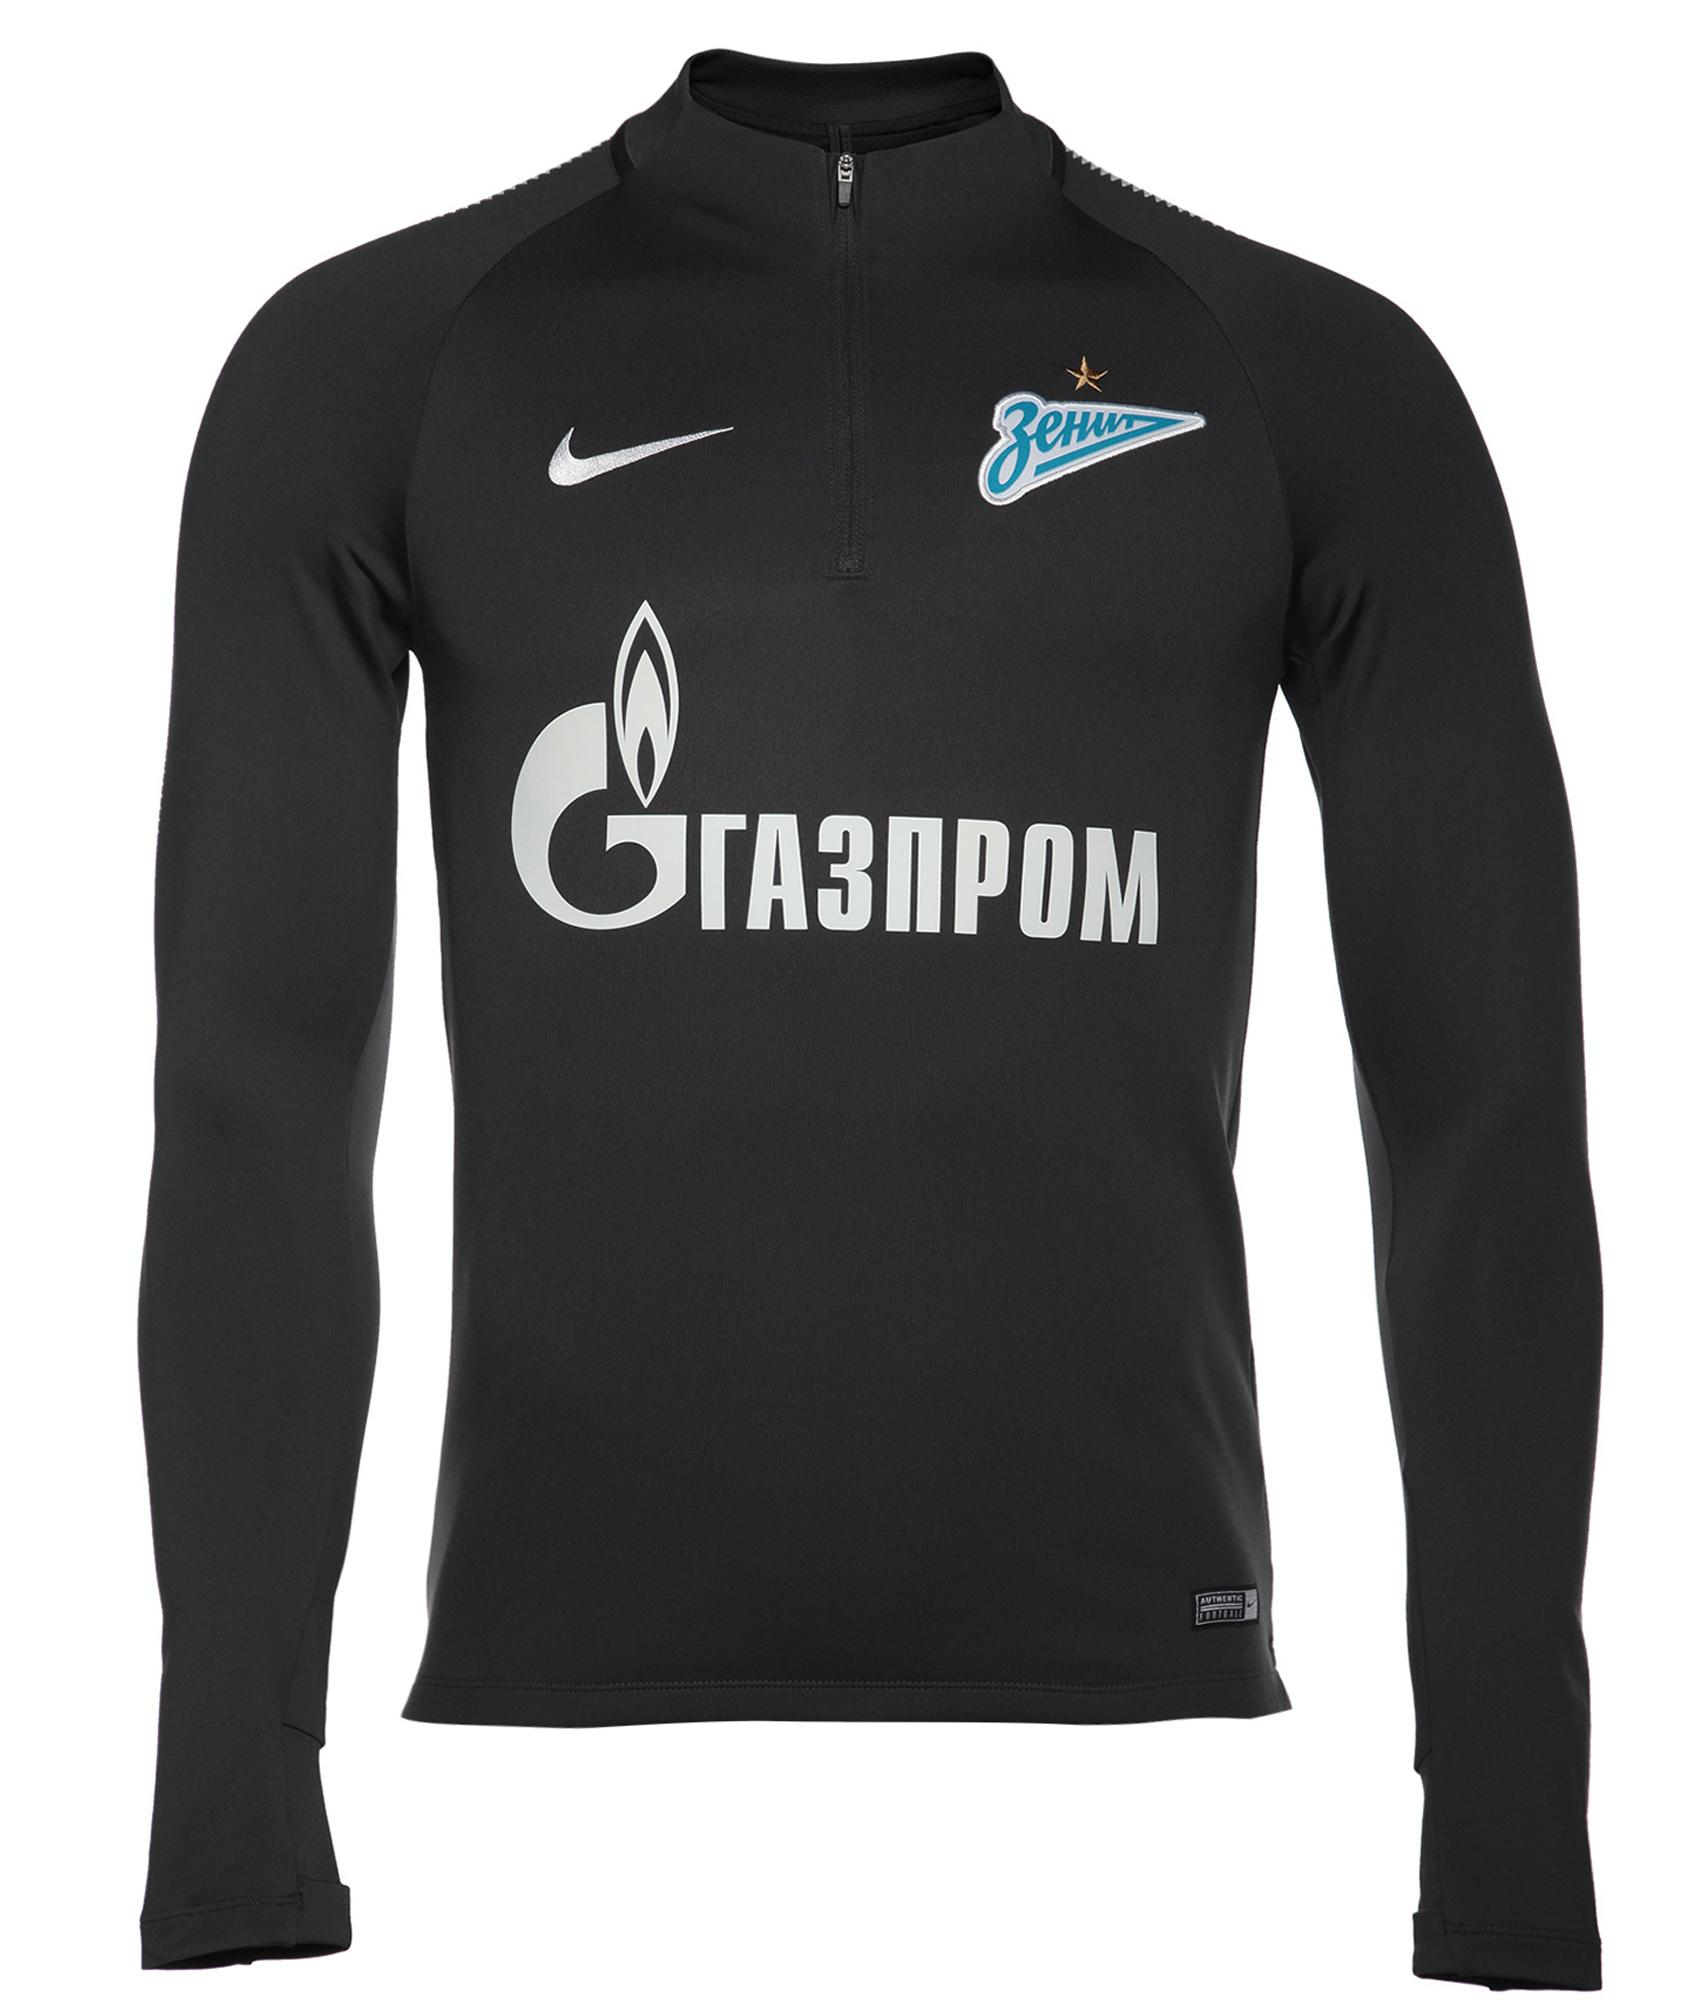 Джемпер тренировочный Nike Nike Цвет-Темно-Серый джемпер тренировочный подростковый nike цвет темно синий размер m